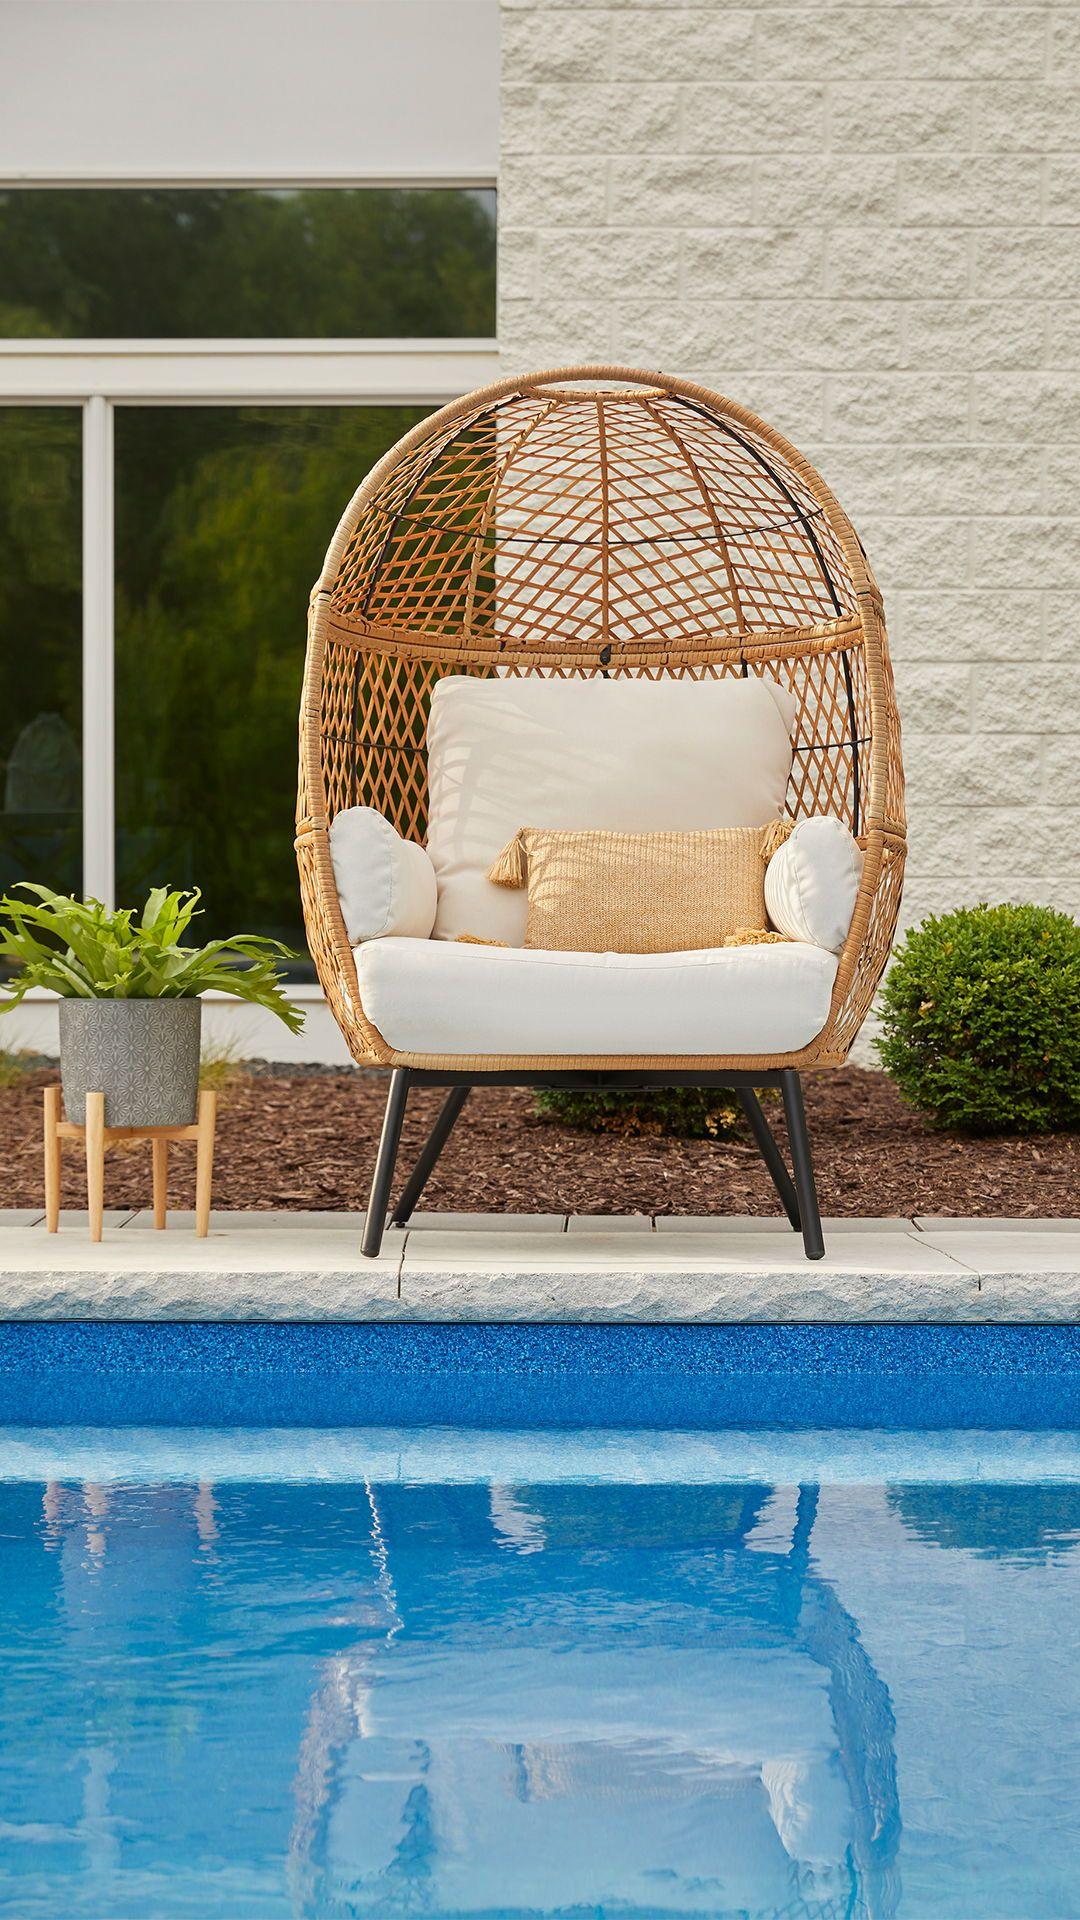 Patio & garden in 2020 Egg chair, Better homes, Pod chair